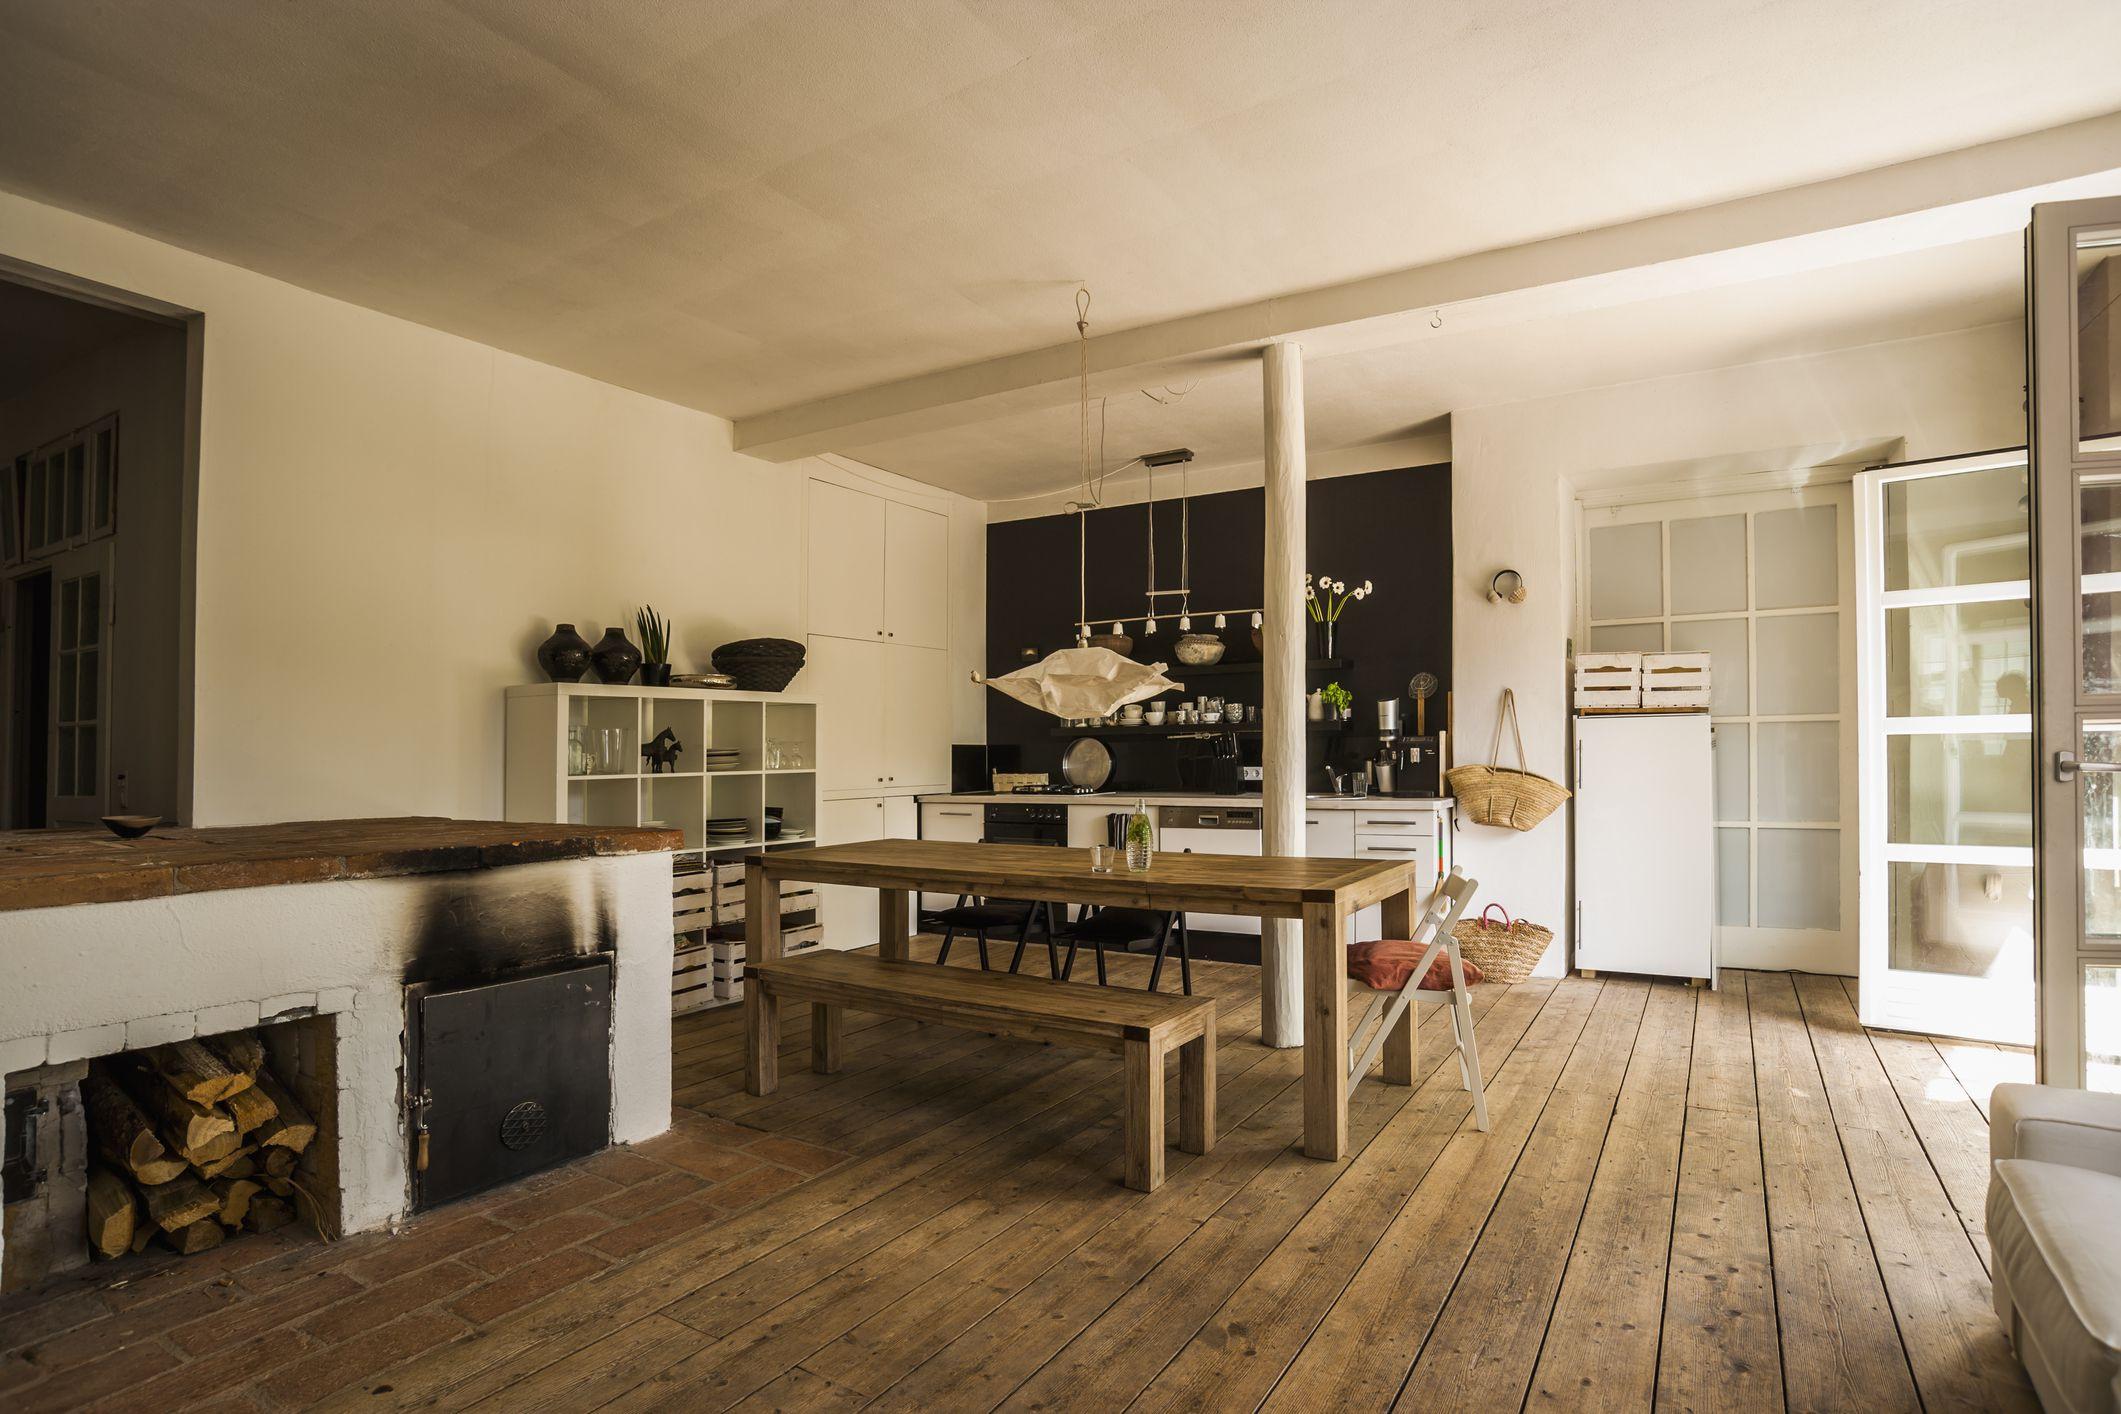 hardwood floor refinishing new orleans of vinyl wood flooring versus natural hardwood inside diningroom woodenfloor gettyimages 544546775 590e57565f9b58647043440a